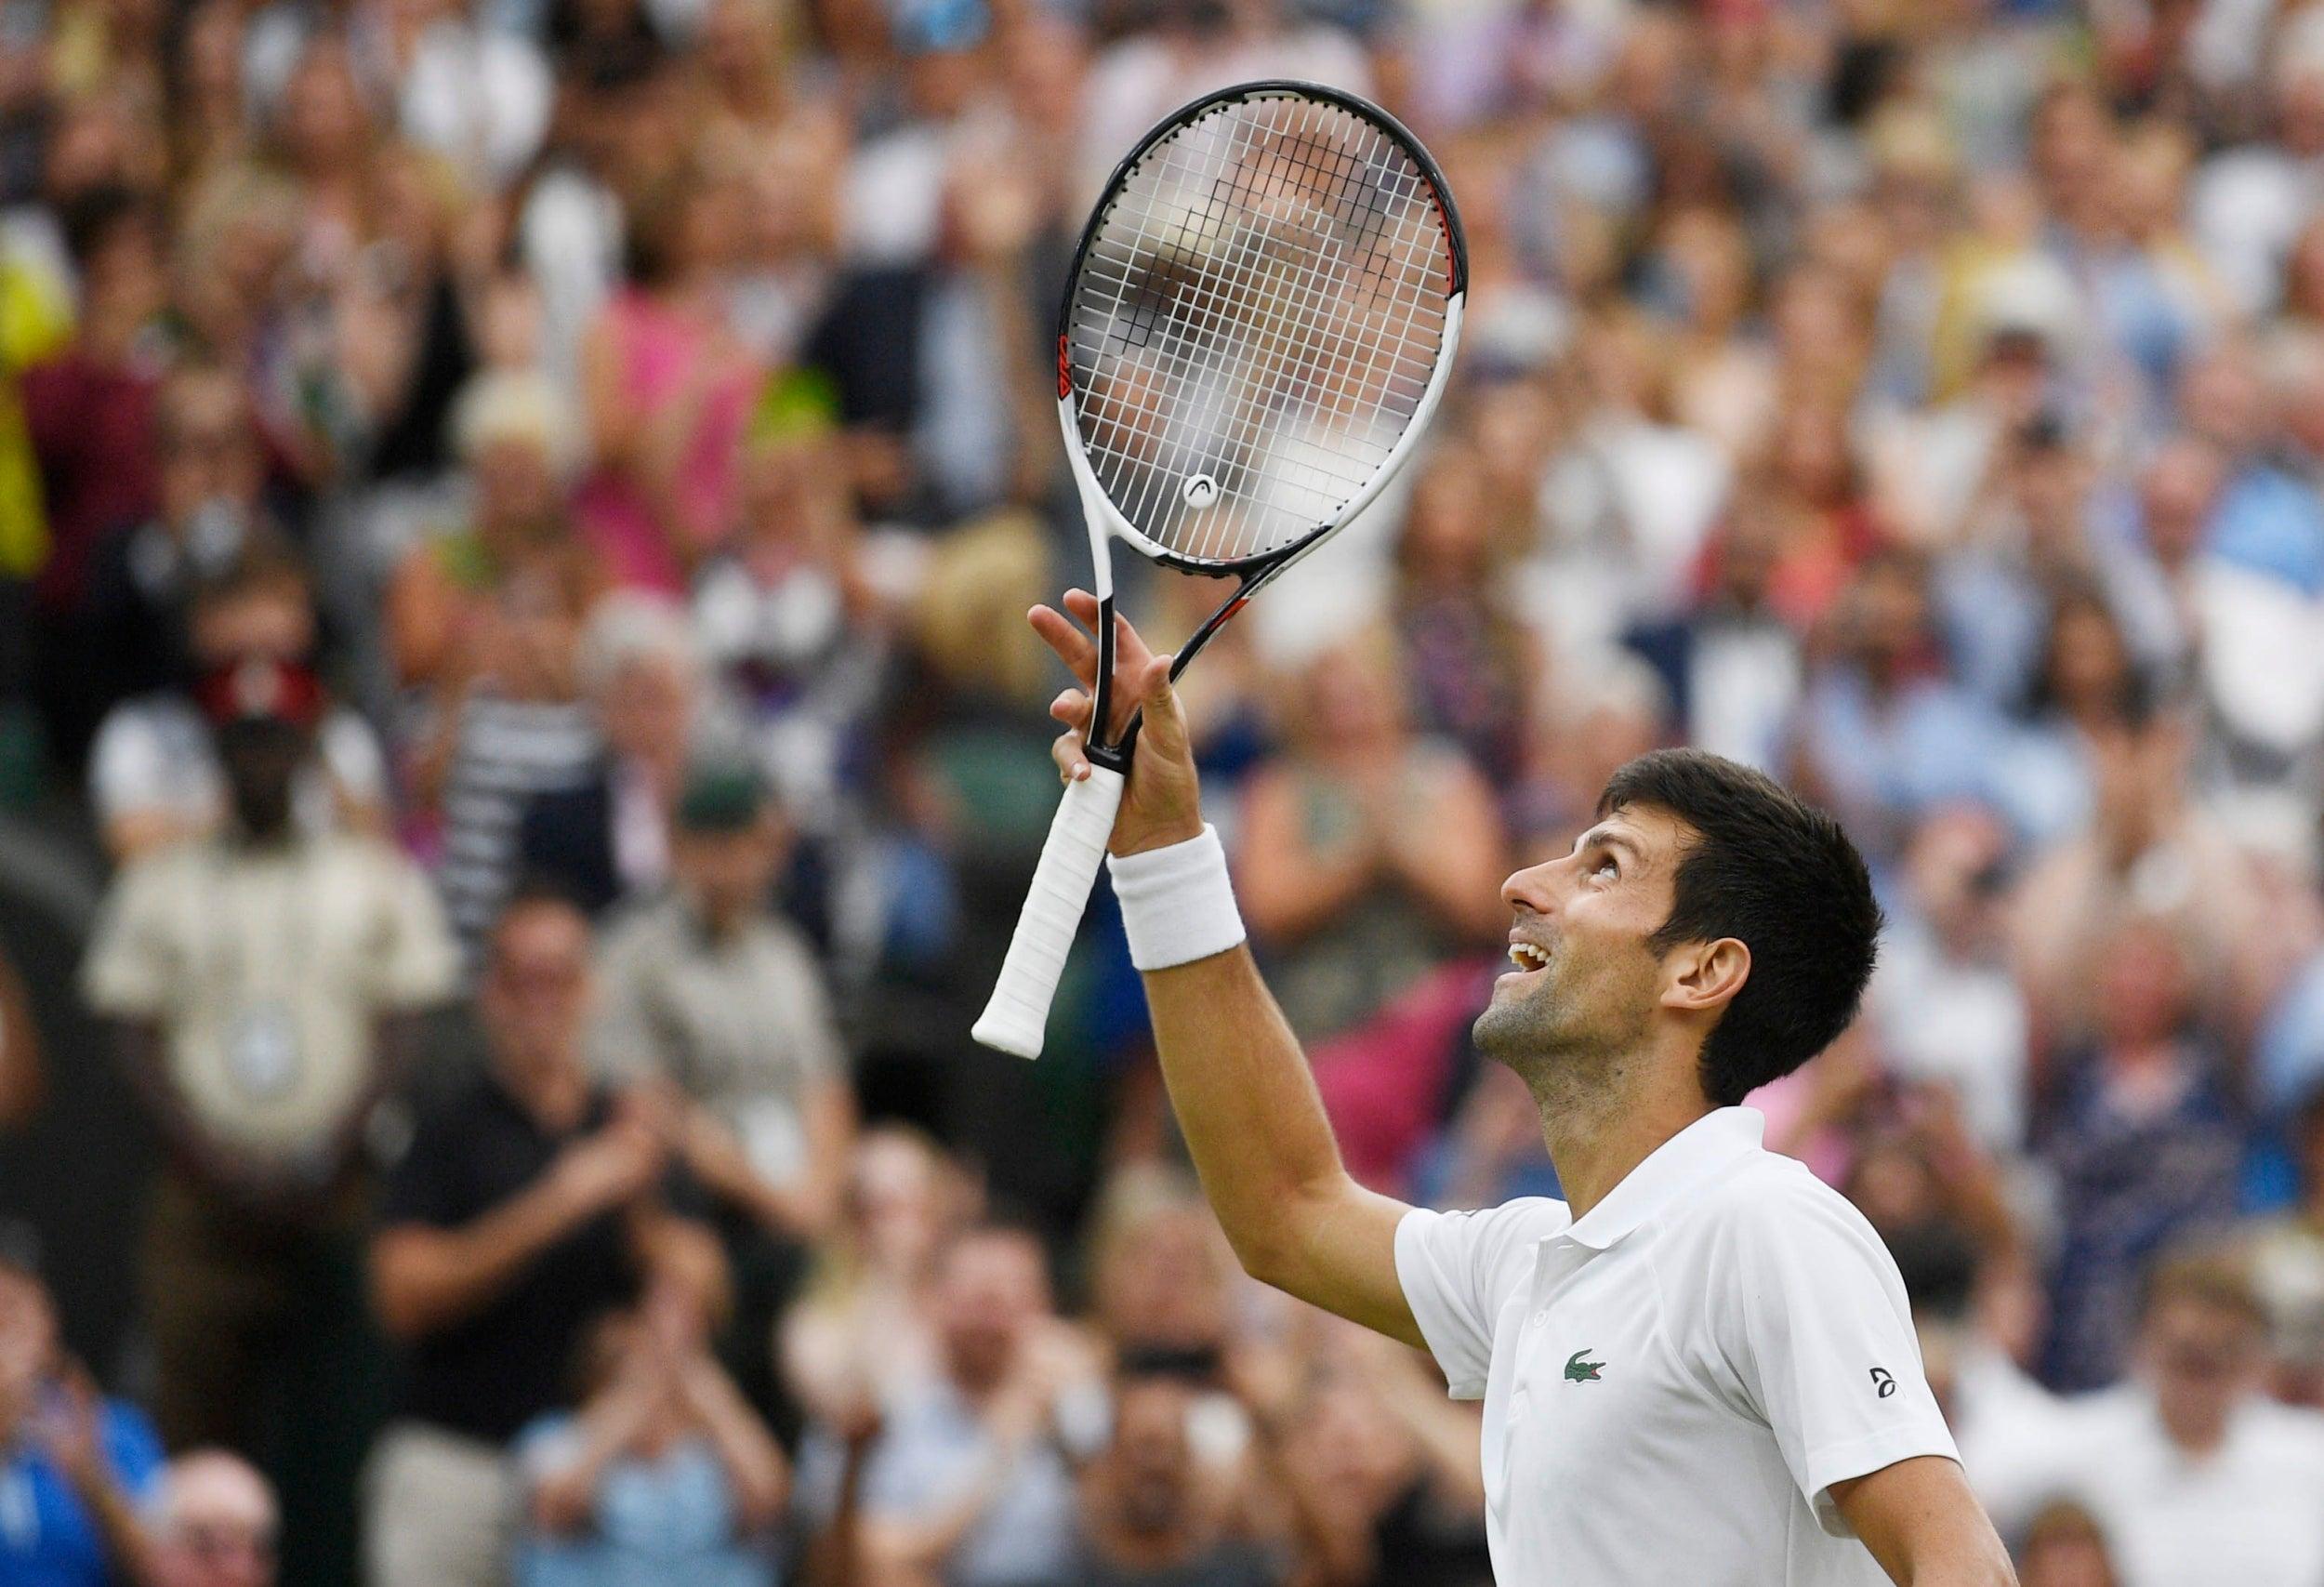 The Casual Tennis Fans Nostalgia For >> Live Tennis Stream Service Lets Fans Watch Wimbledon Final Online